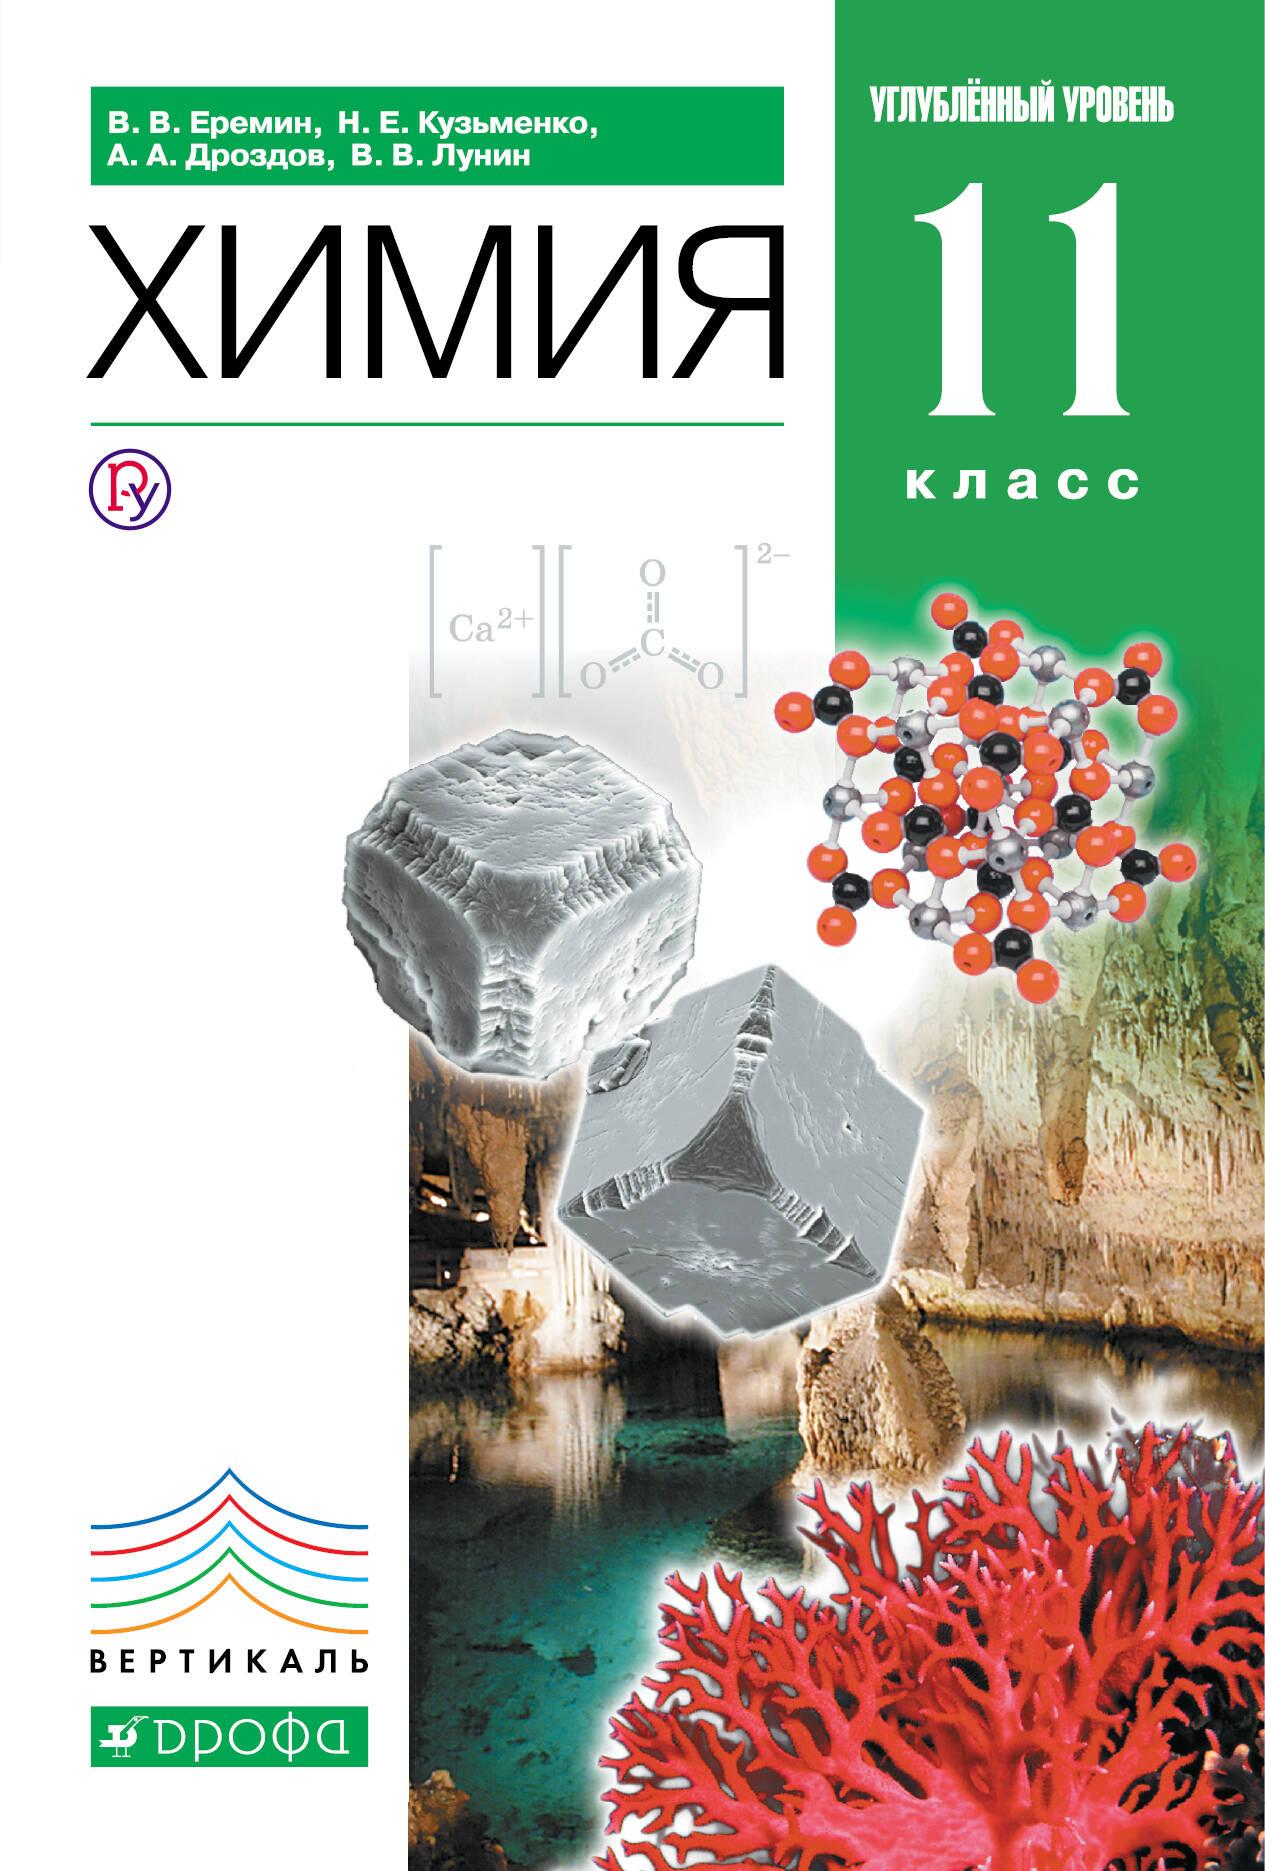 Химия гдз 11 класс еремин кузьменко дроздов лунин